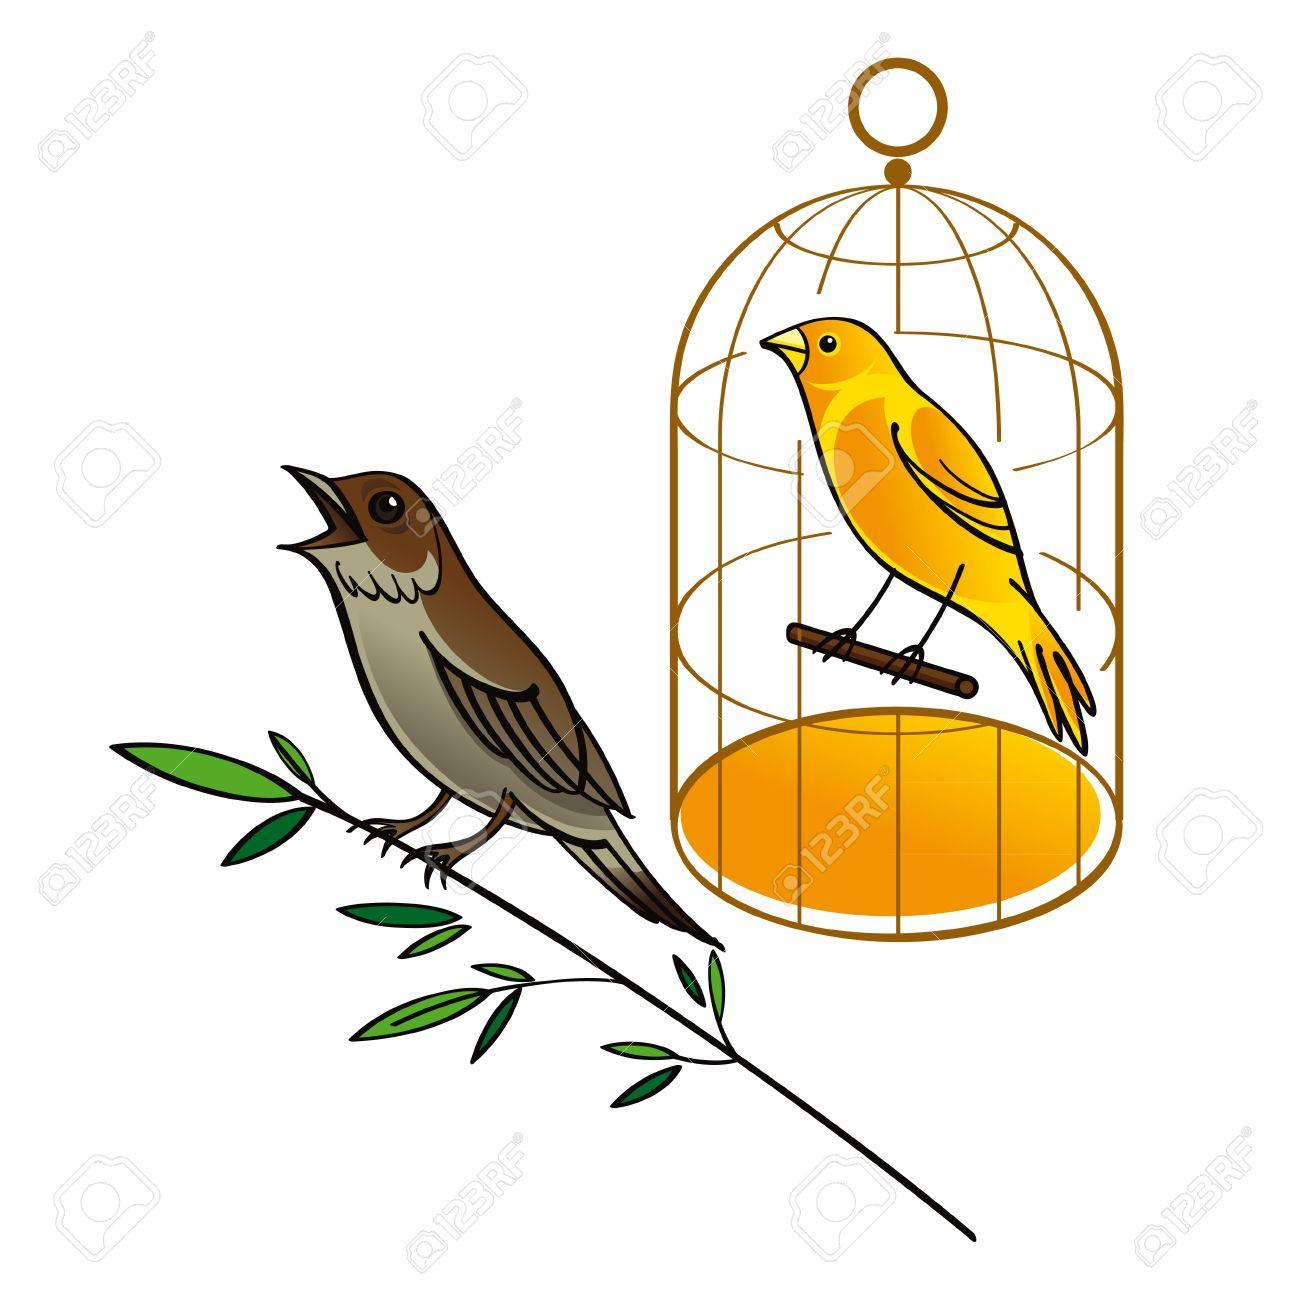 Nightingale bird clipart.